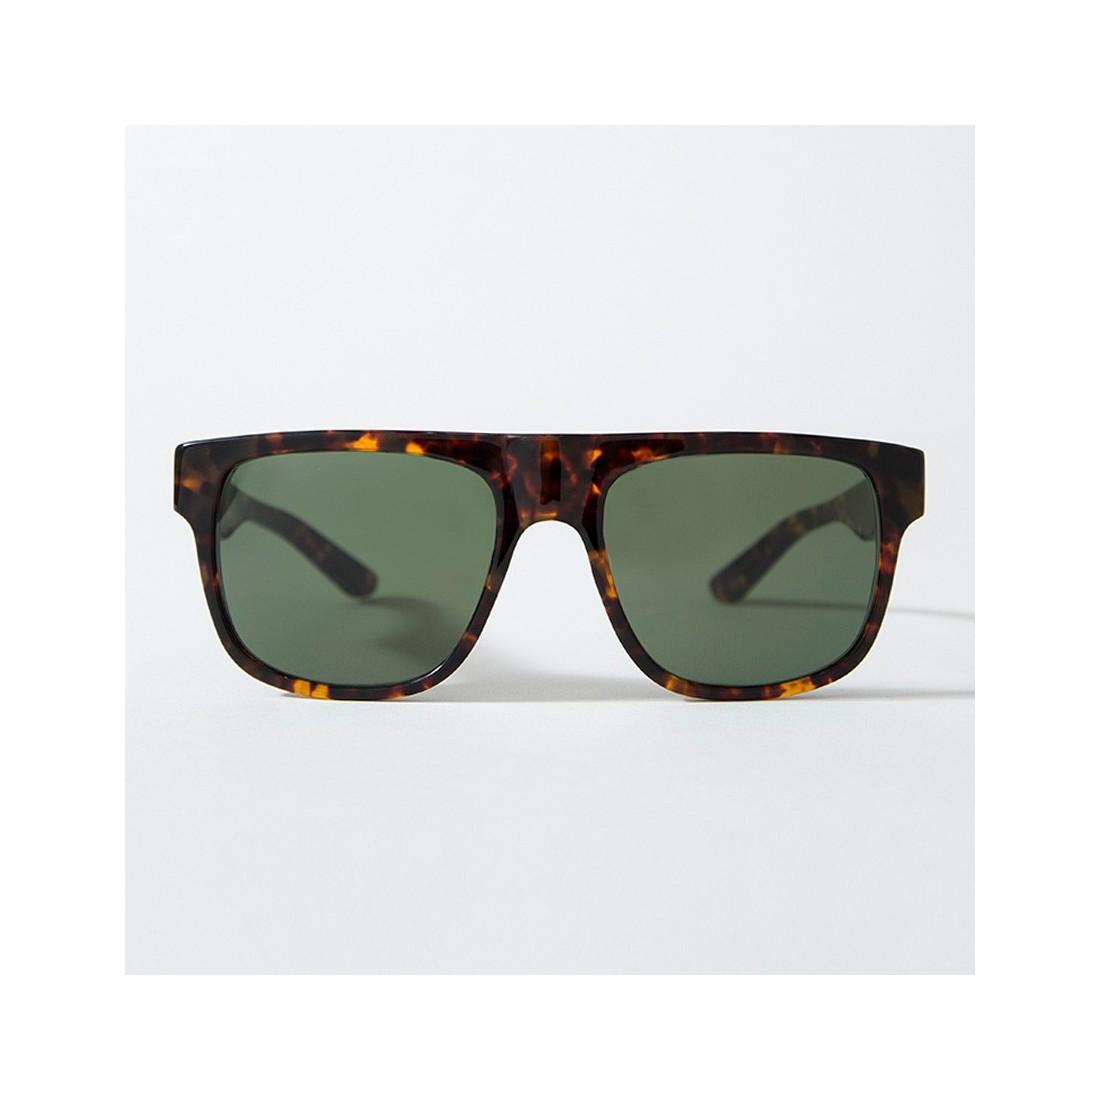 f720c3c0232f6 Stüssy Santana Sunglasses Gloss Tortoise